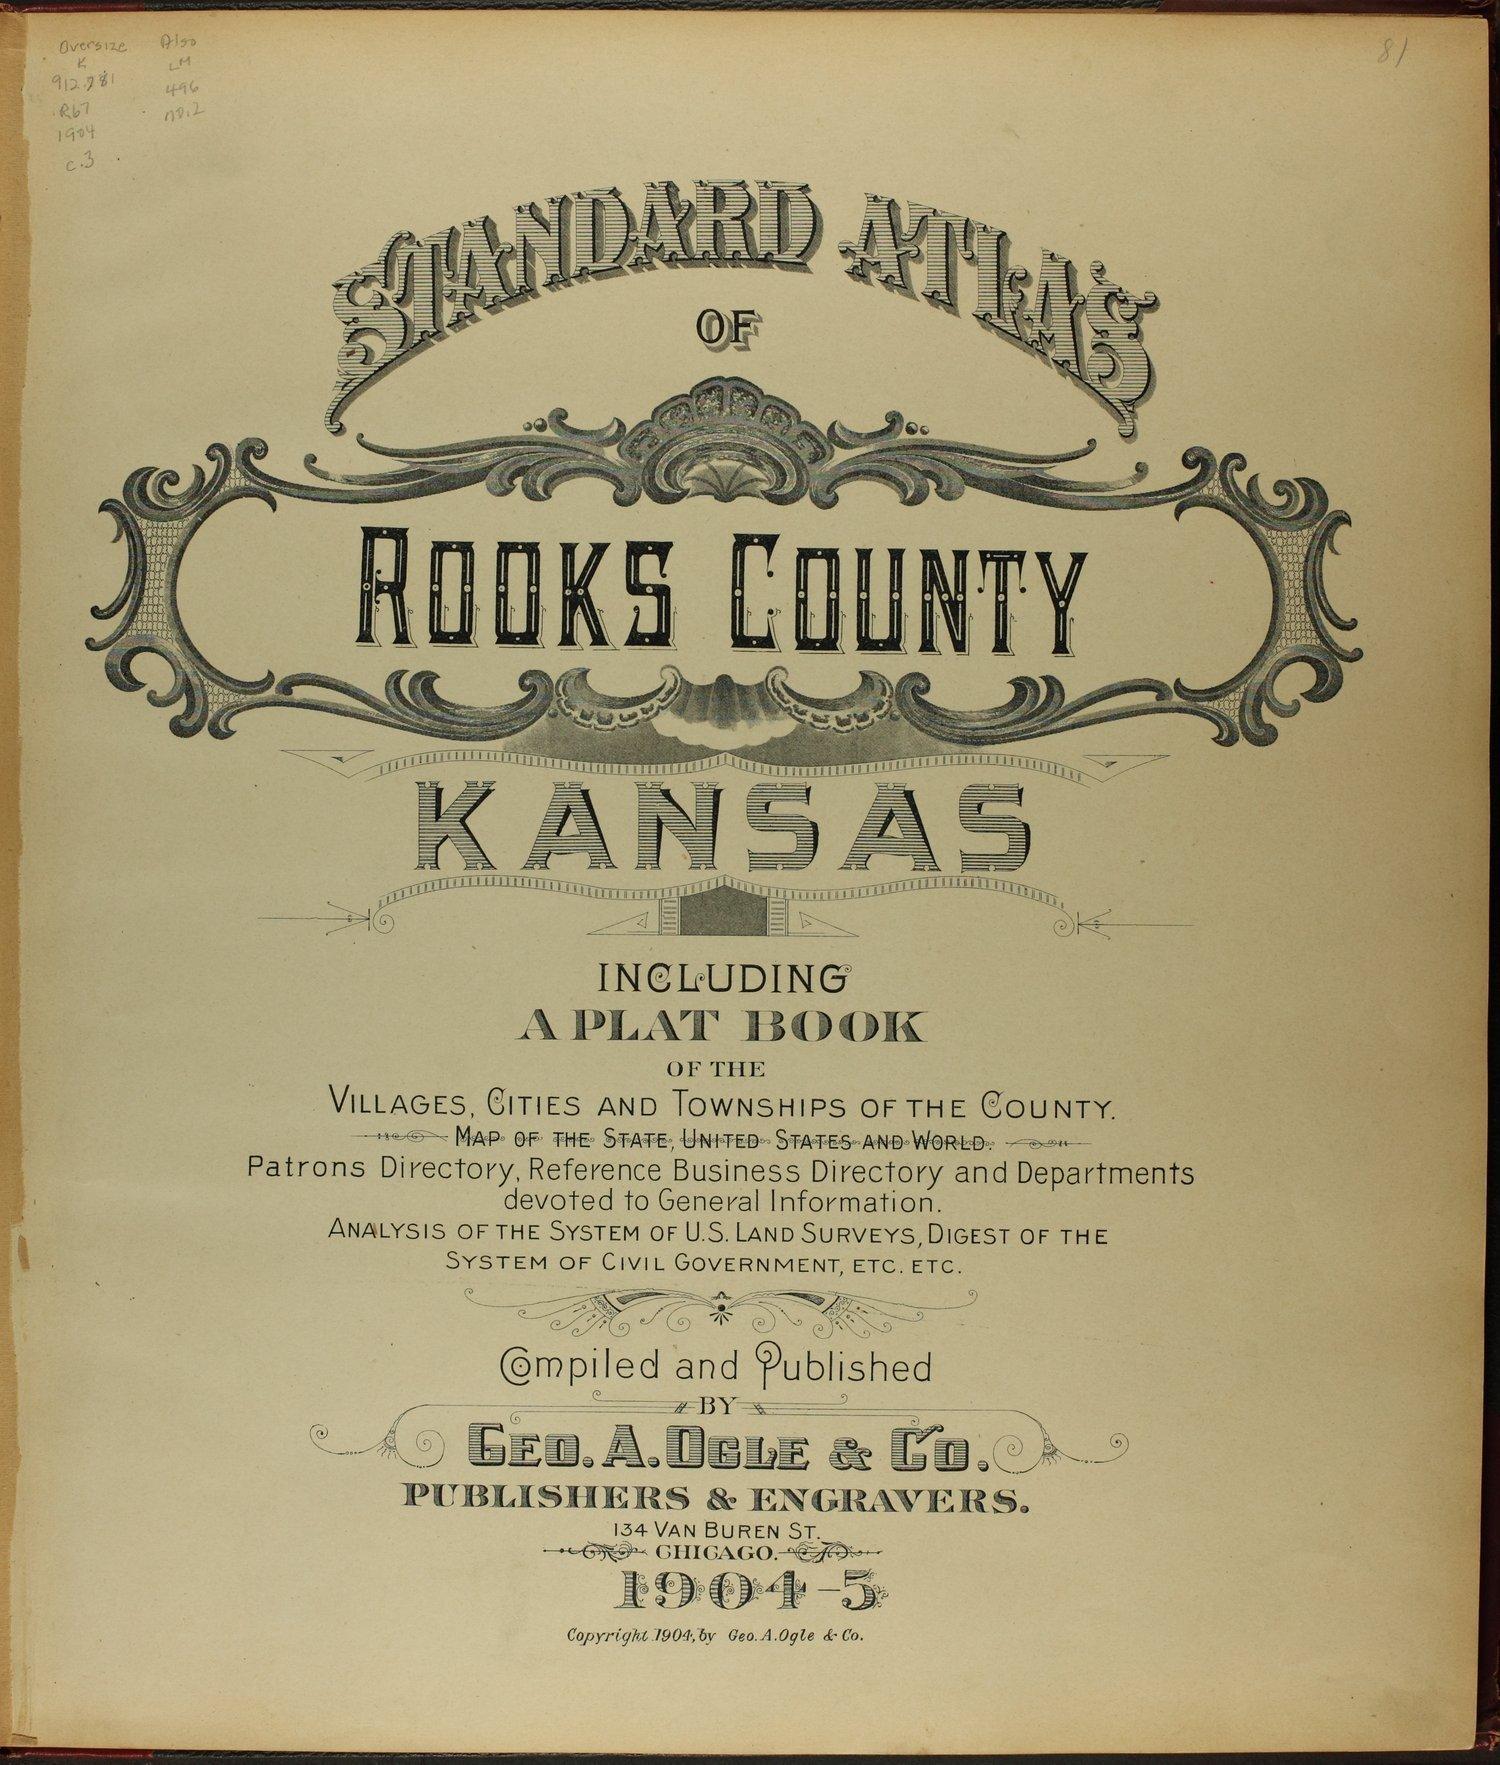 Standard atlas of Rooks County, Kansas - Title Page